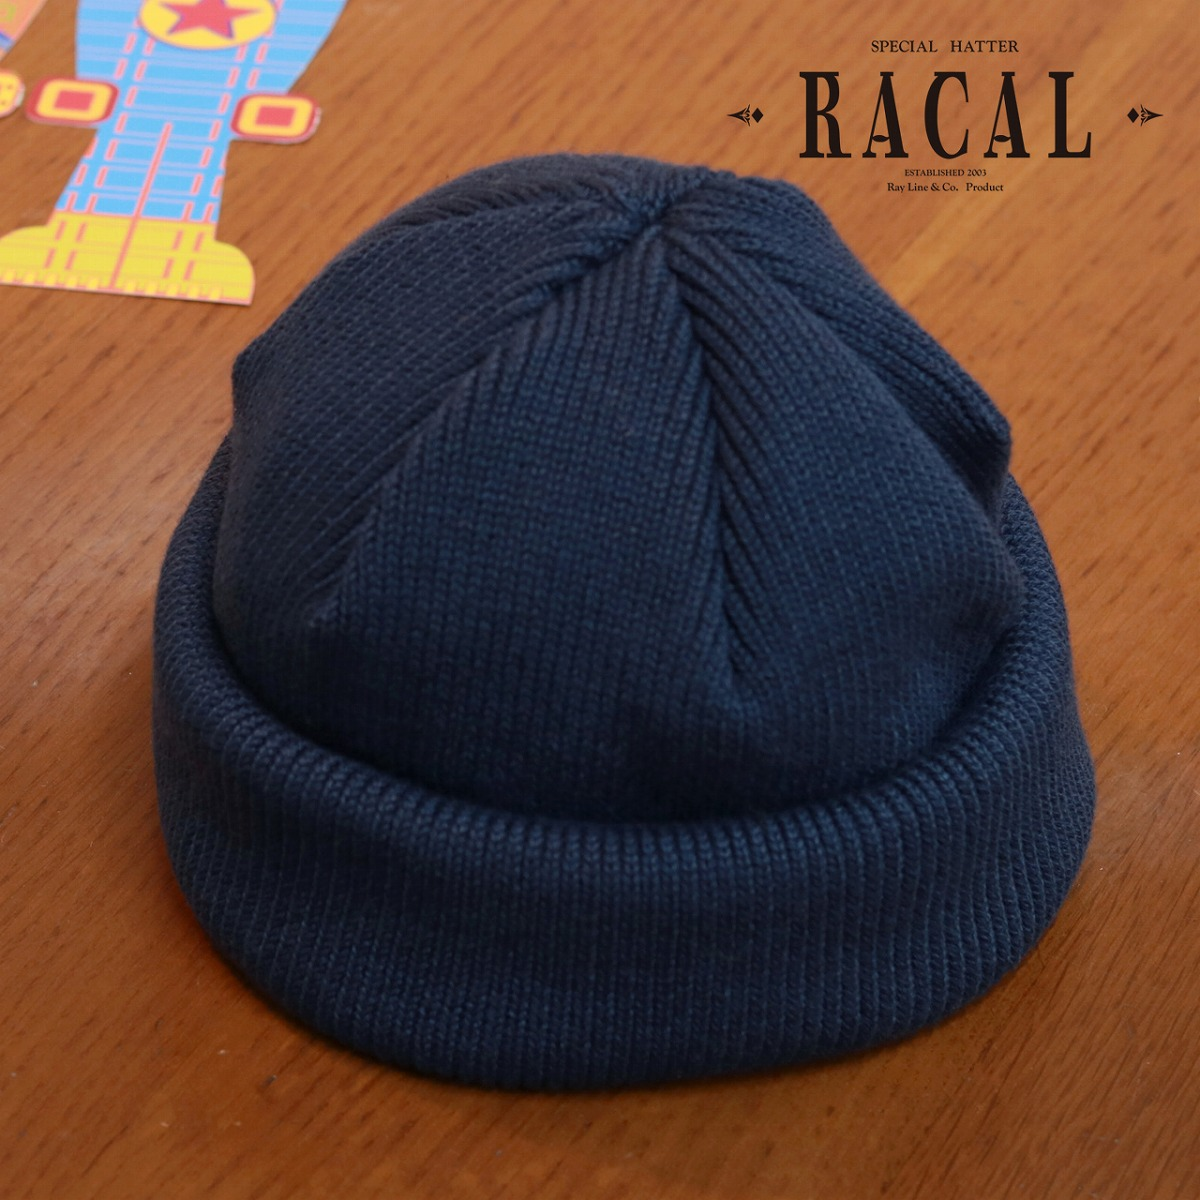 7dd29aacc9425 racal knit cap plain fabric Shin pull casual clothes unisex   dark blue  navy  roll knit cap  made in fisherman cap men ラカルニット hat roll cap rib knit  ...